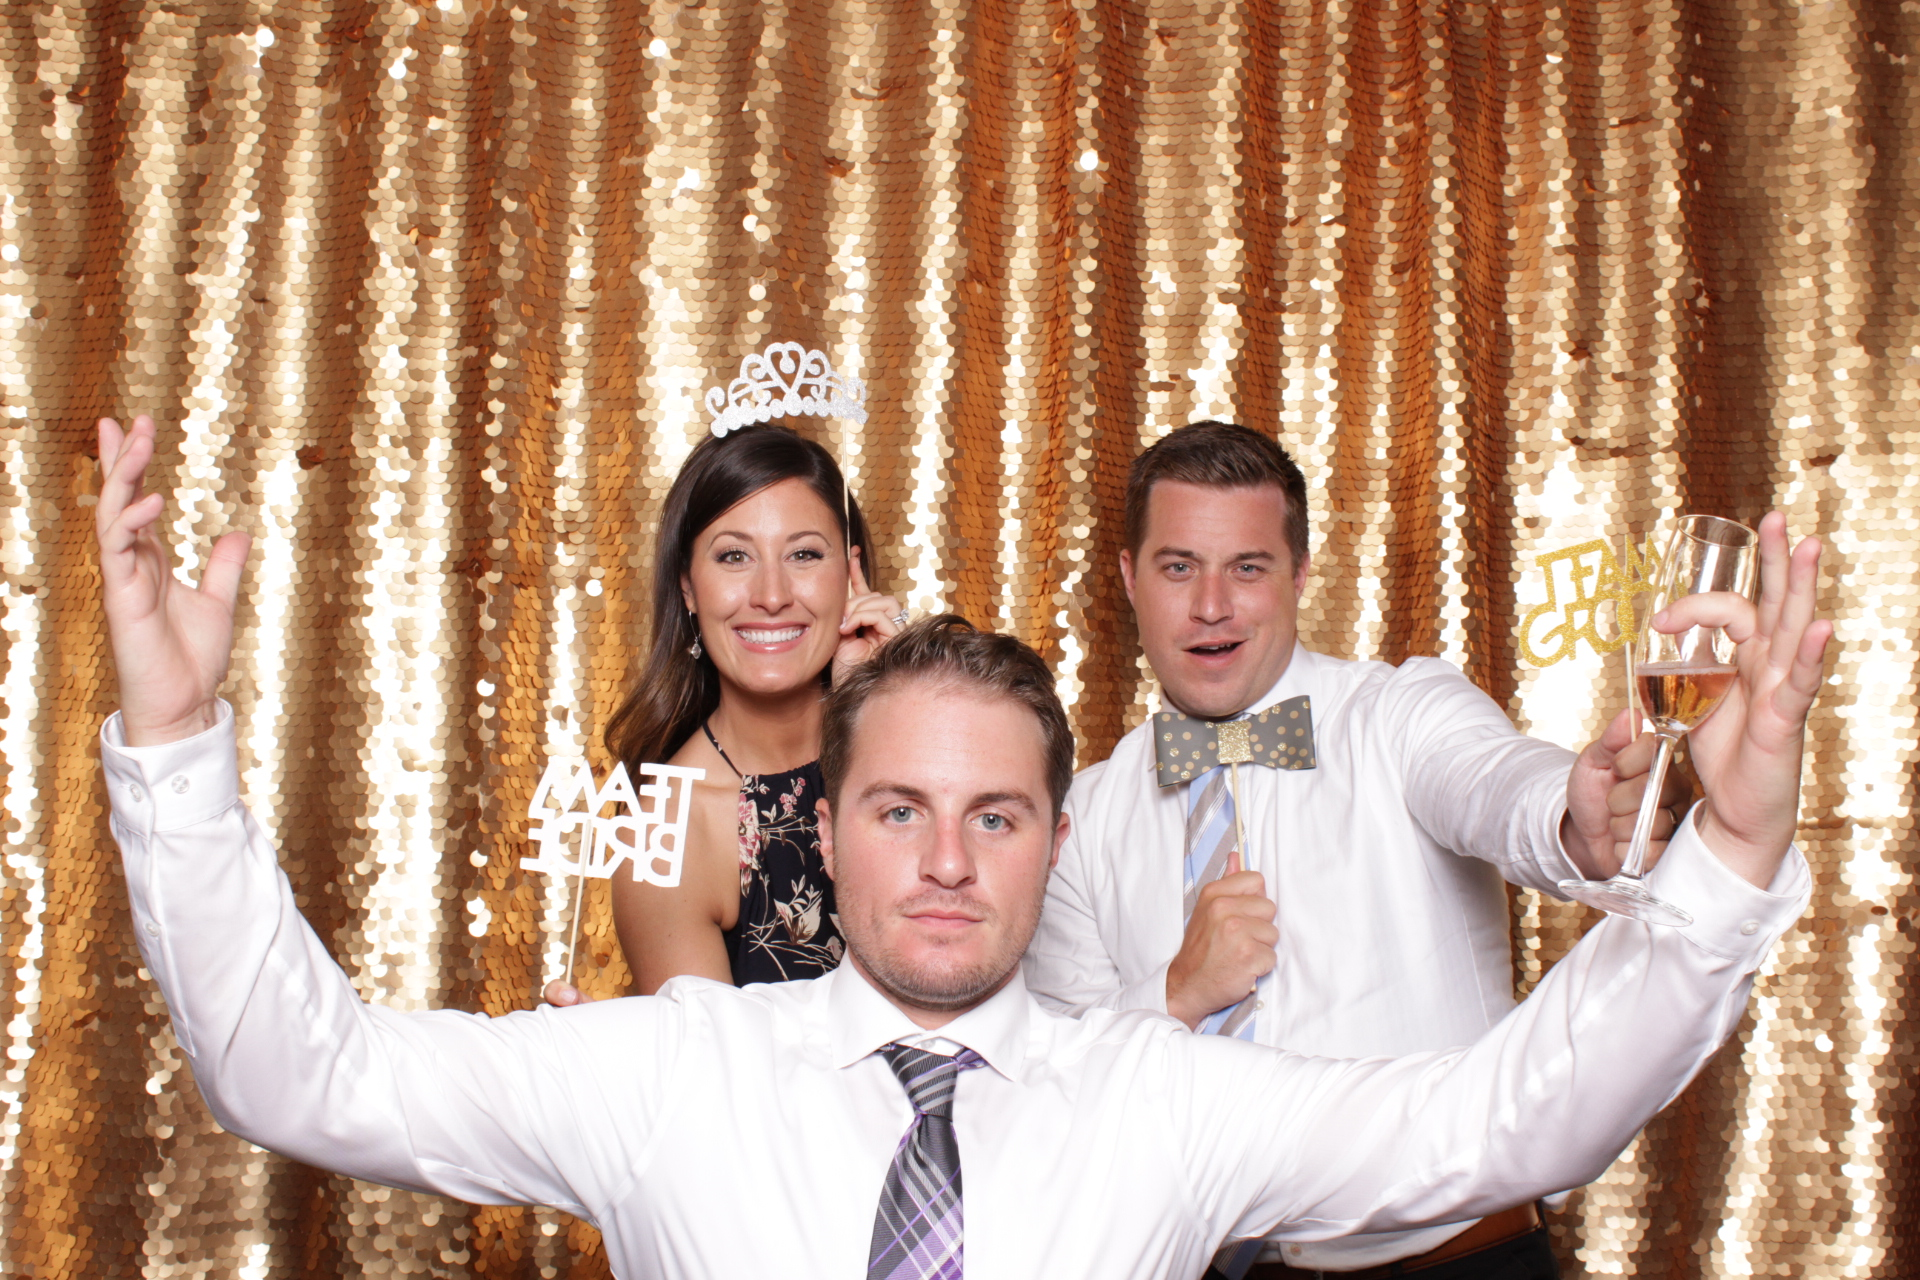 Minneapolis_wedding_photo_booth_Machine_Shop (15).jpg